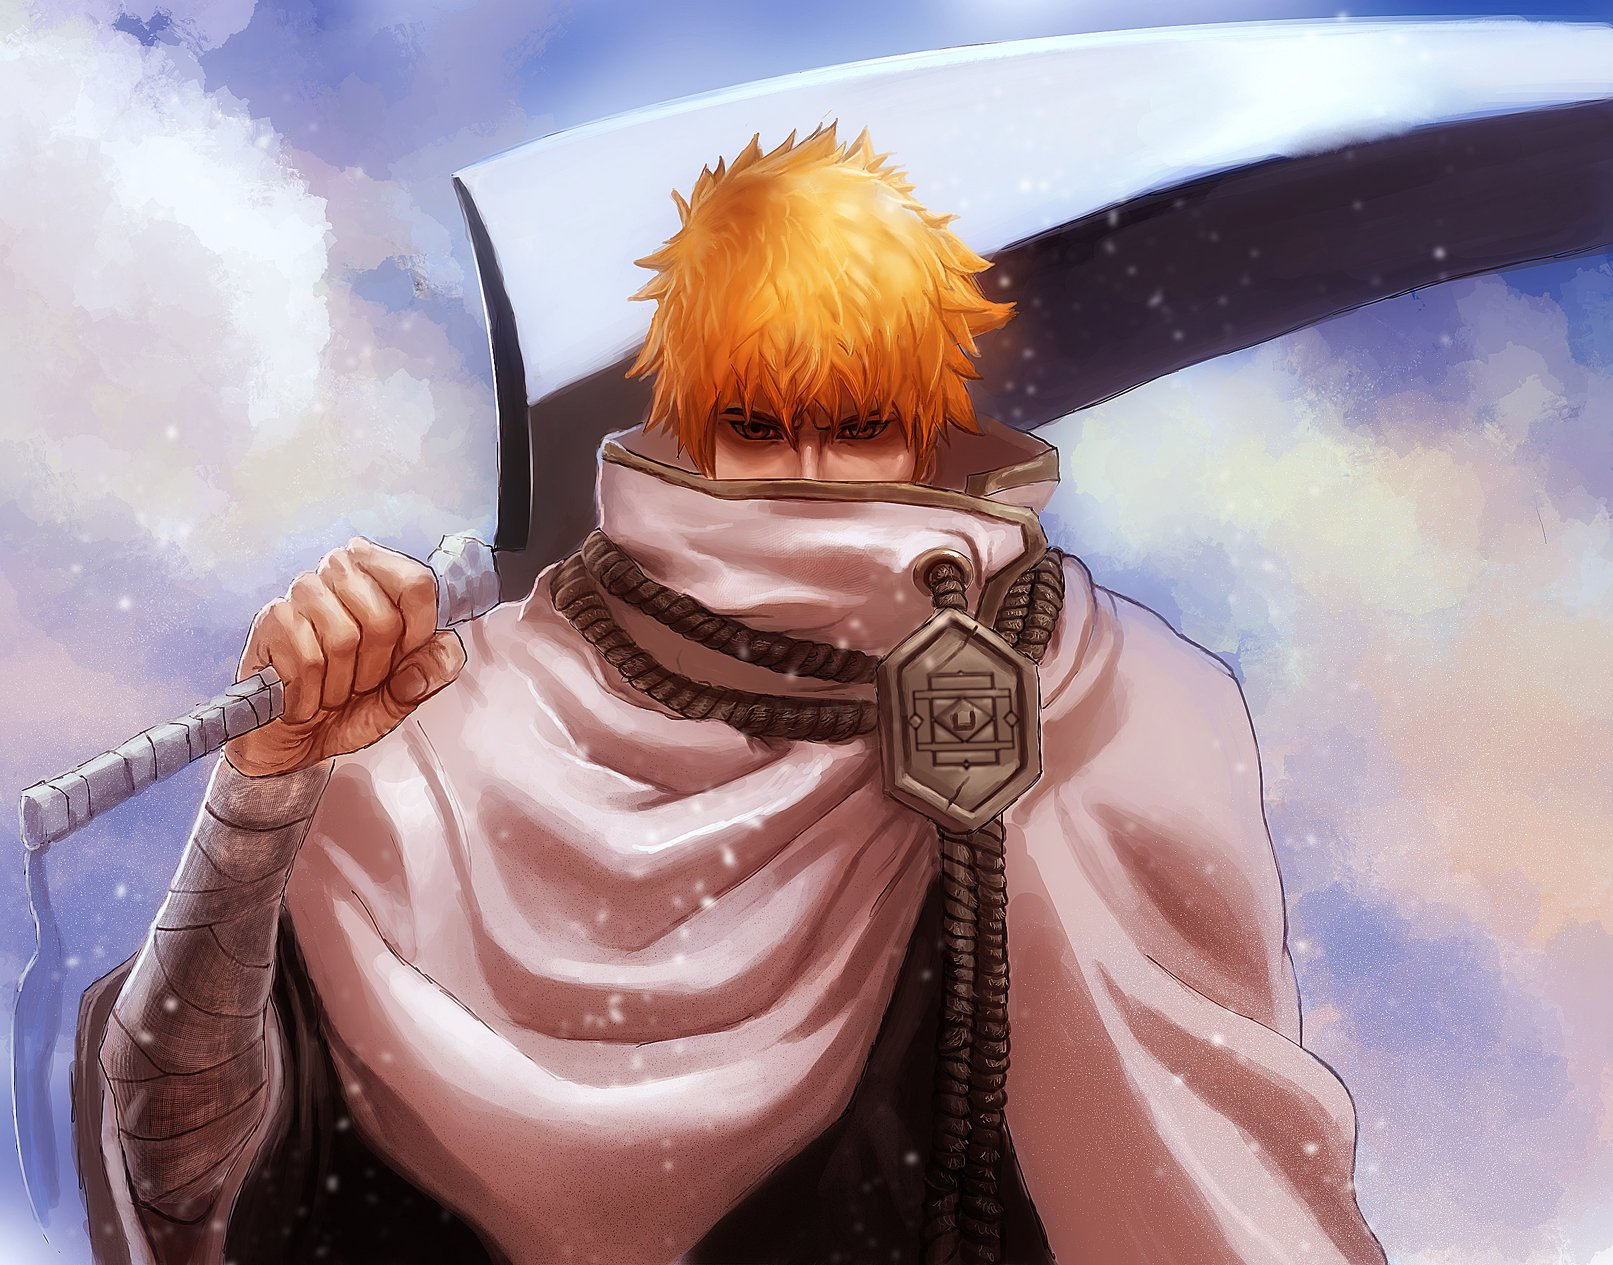 sword wallpaper download